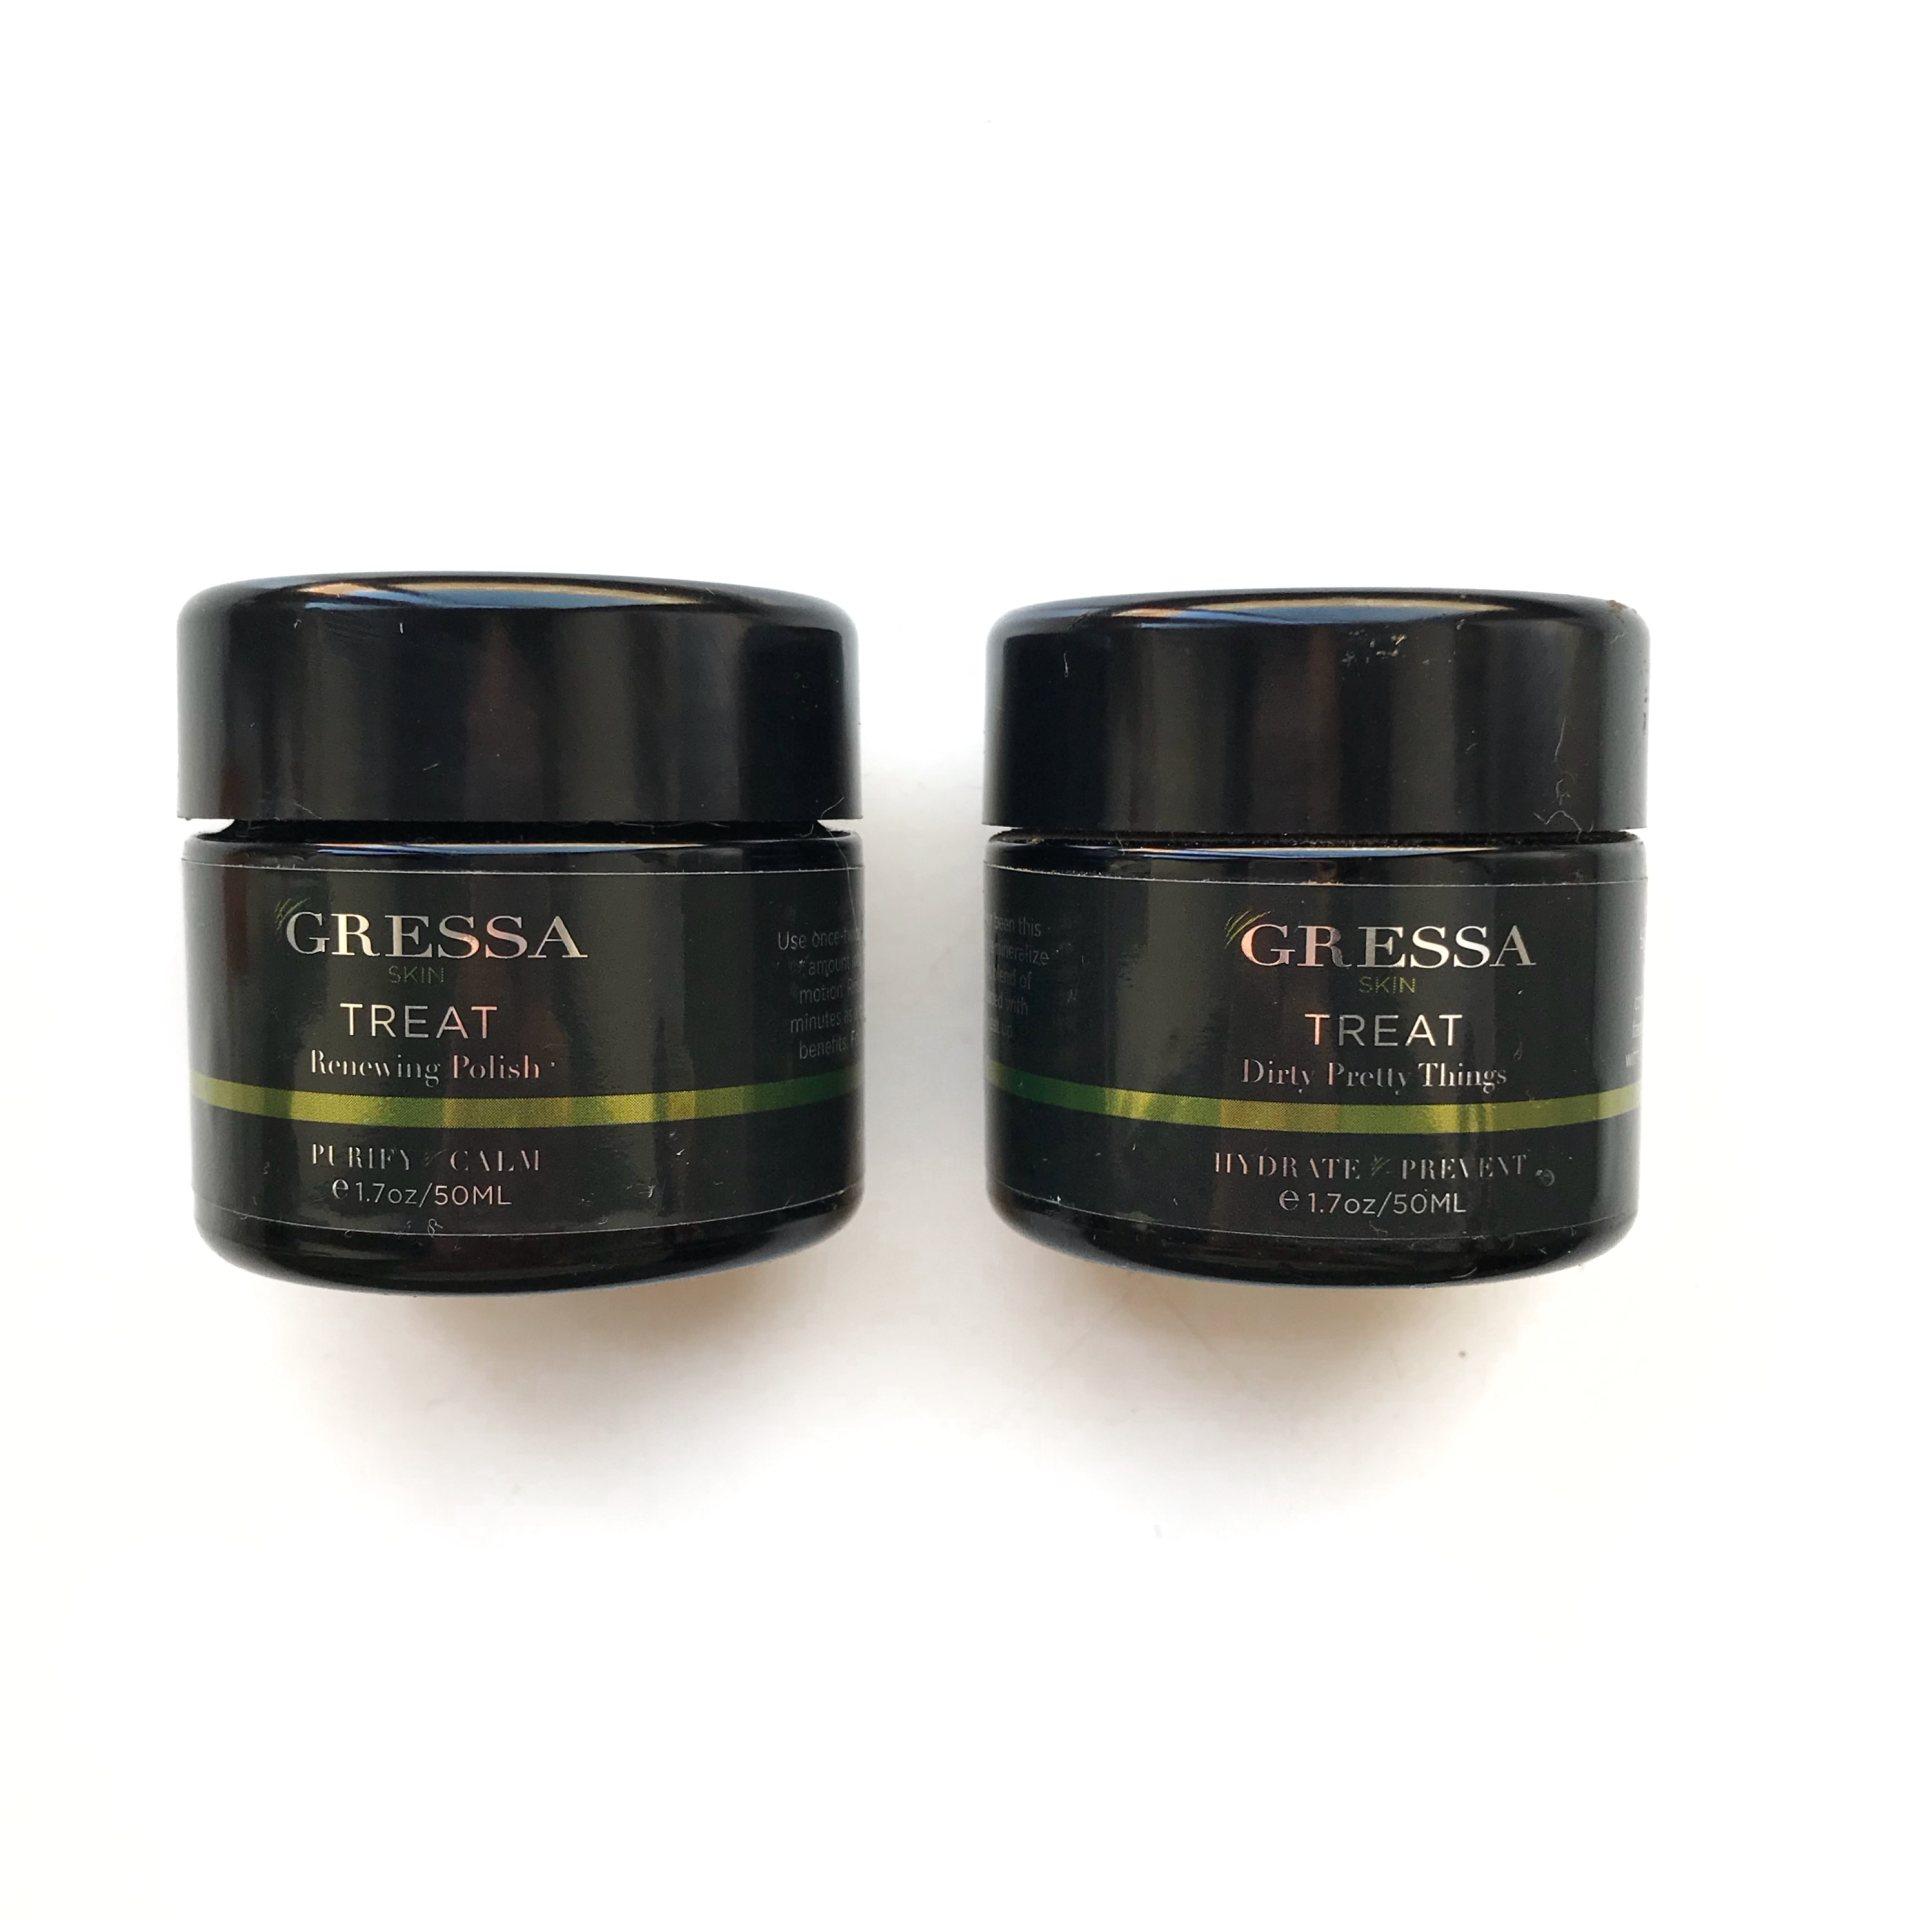 Gressa Skin corrective minimalist foundation